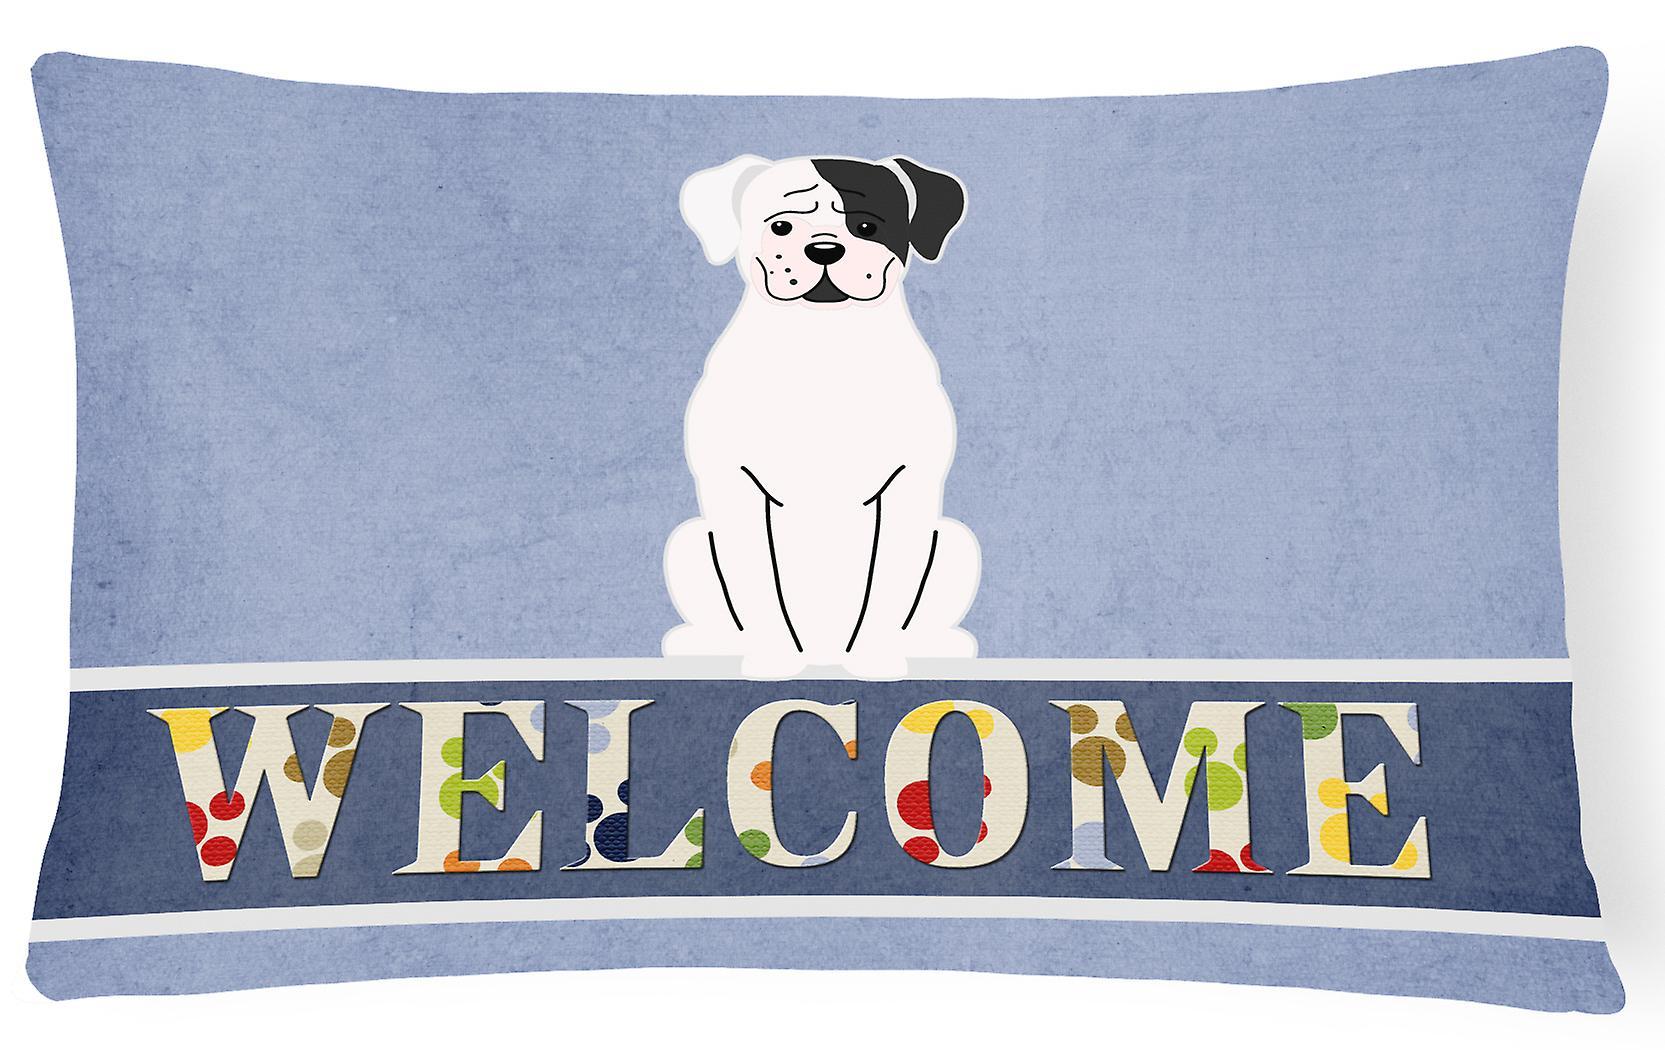 Bienvenue Oreiller Toile Décoratif Tissu Boxer Blanc Cooper CQrthxsdB